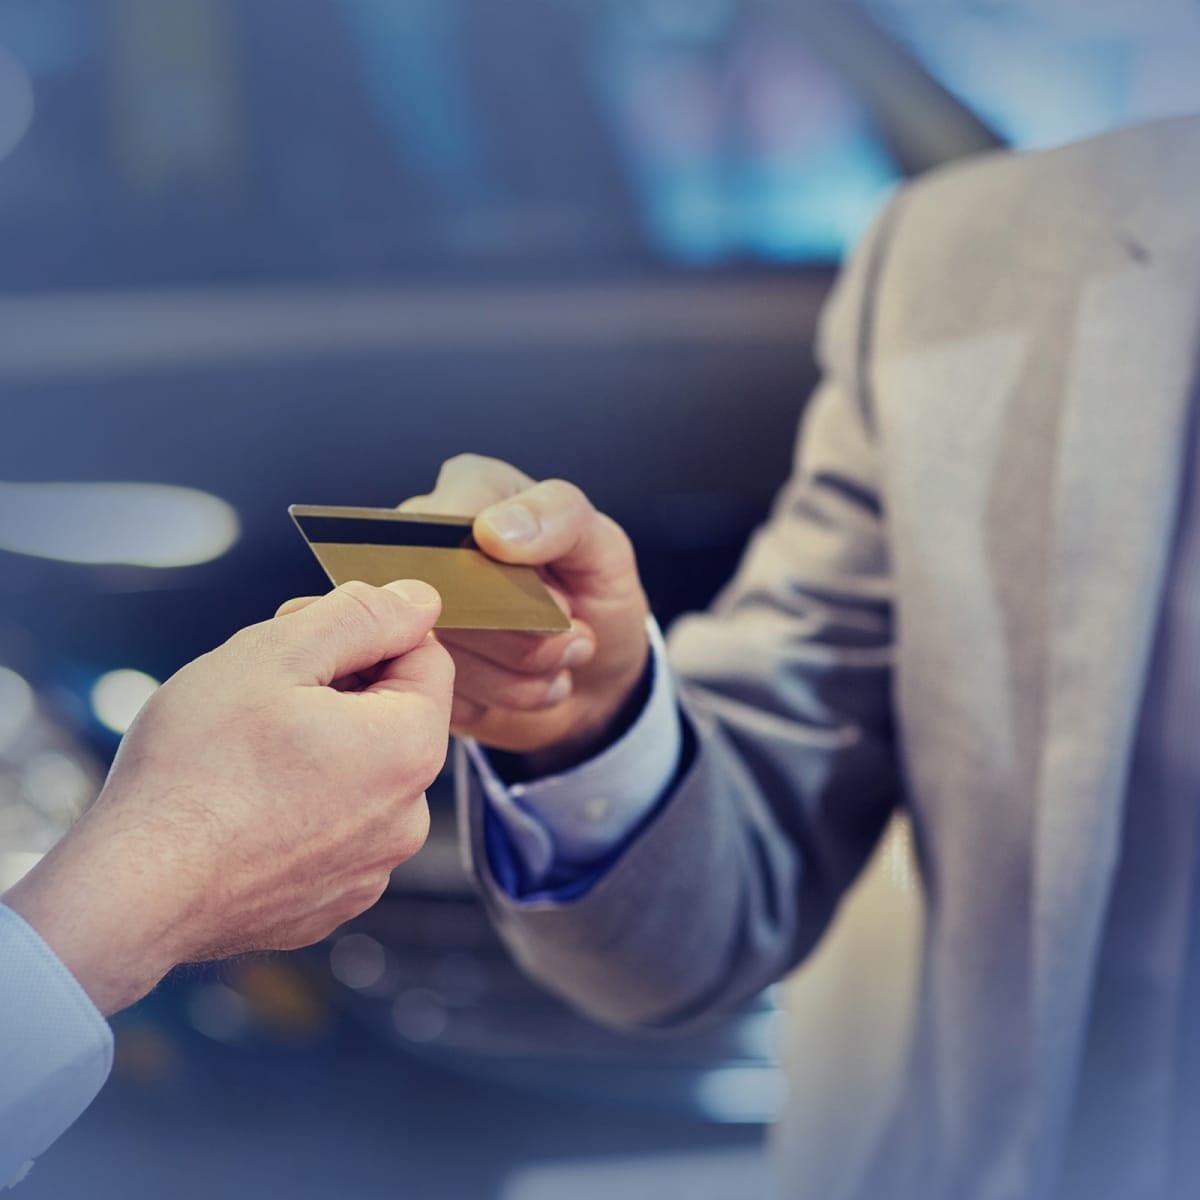 Business debit card standard chartered singapore reheart Choice Image